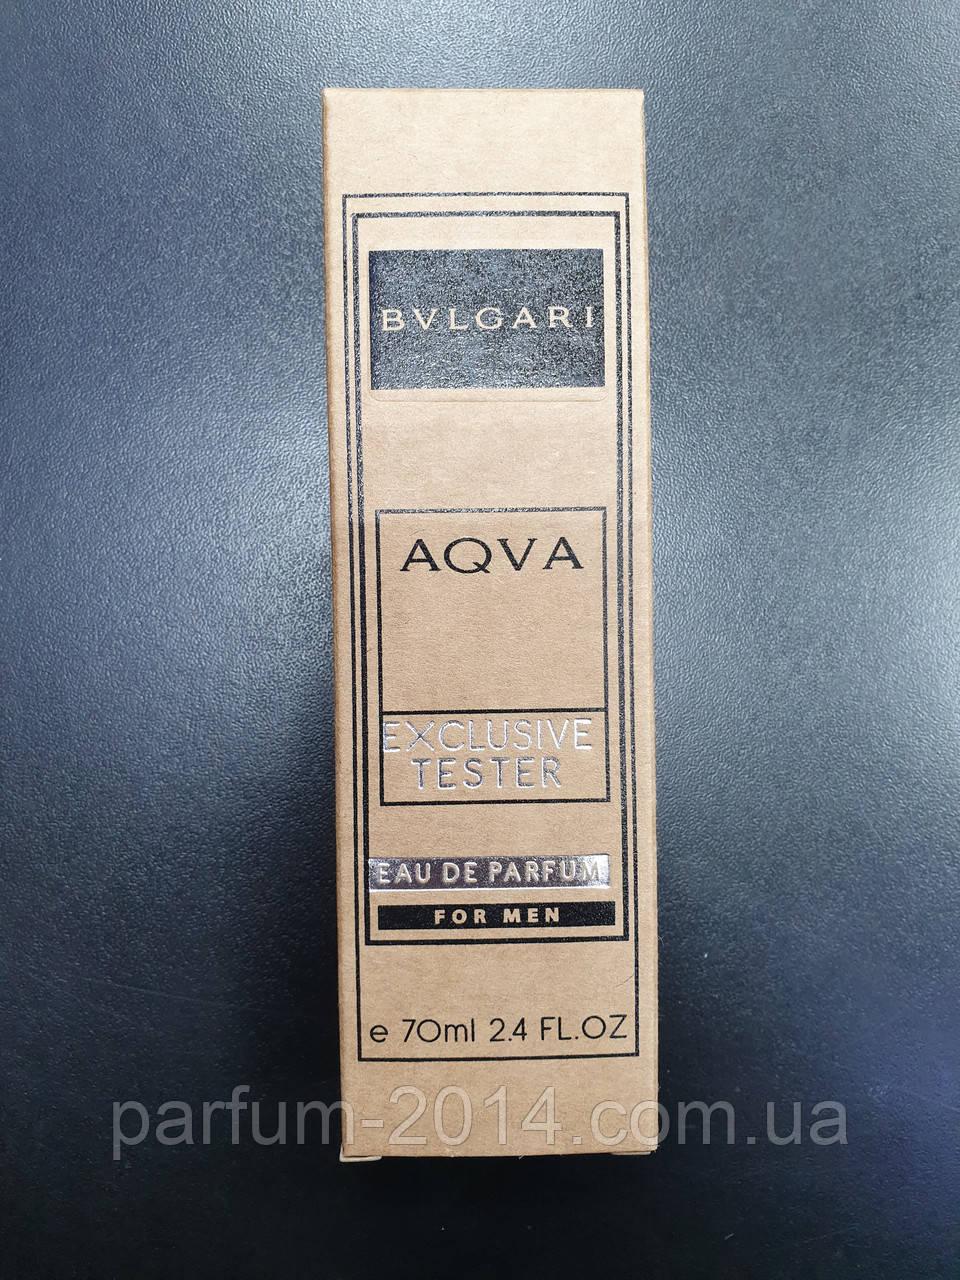 Эксклюзивный тестер Bvlgari Aqua pour homme 70 ml ОАЭ (реплика)